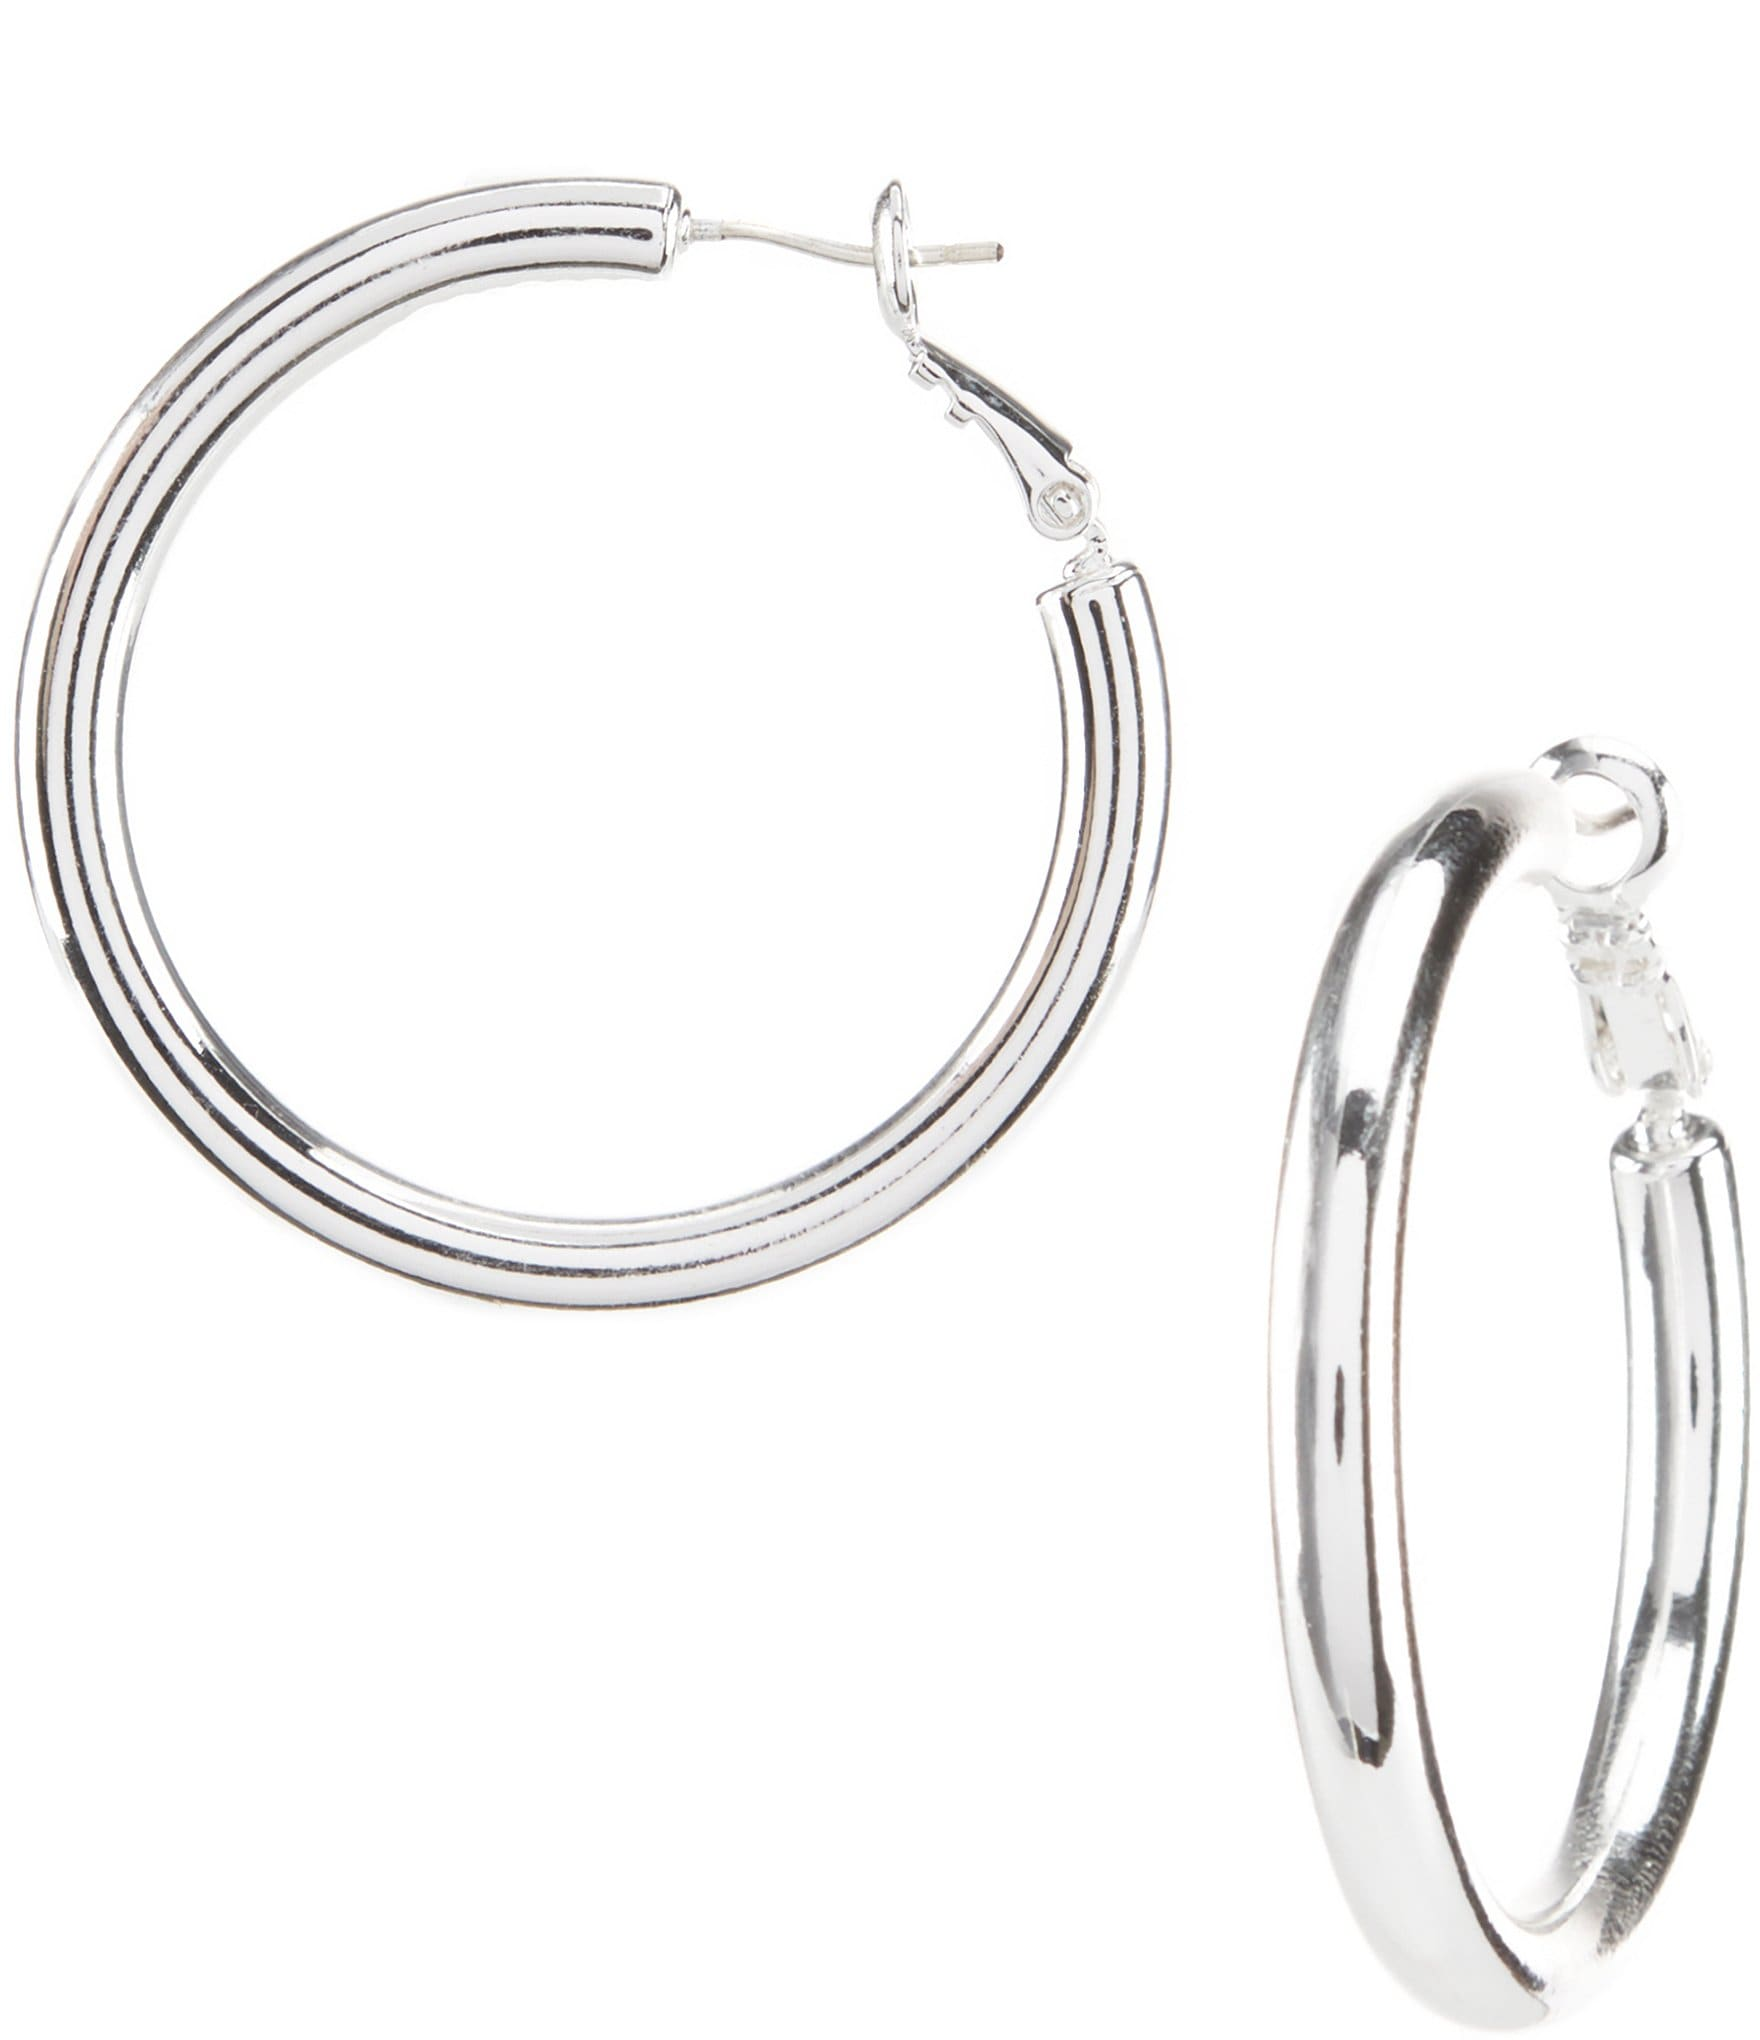 Dillard S Tailored Thick Wire Hoop Earrings